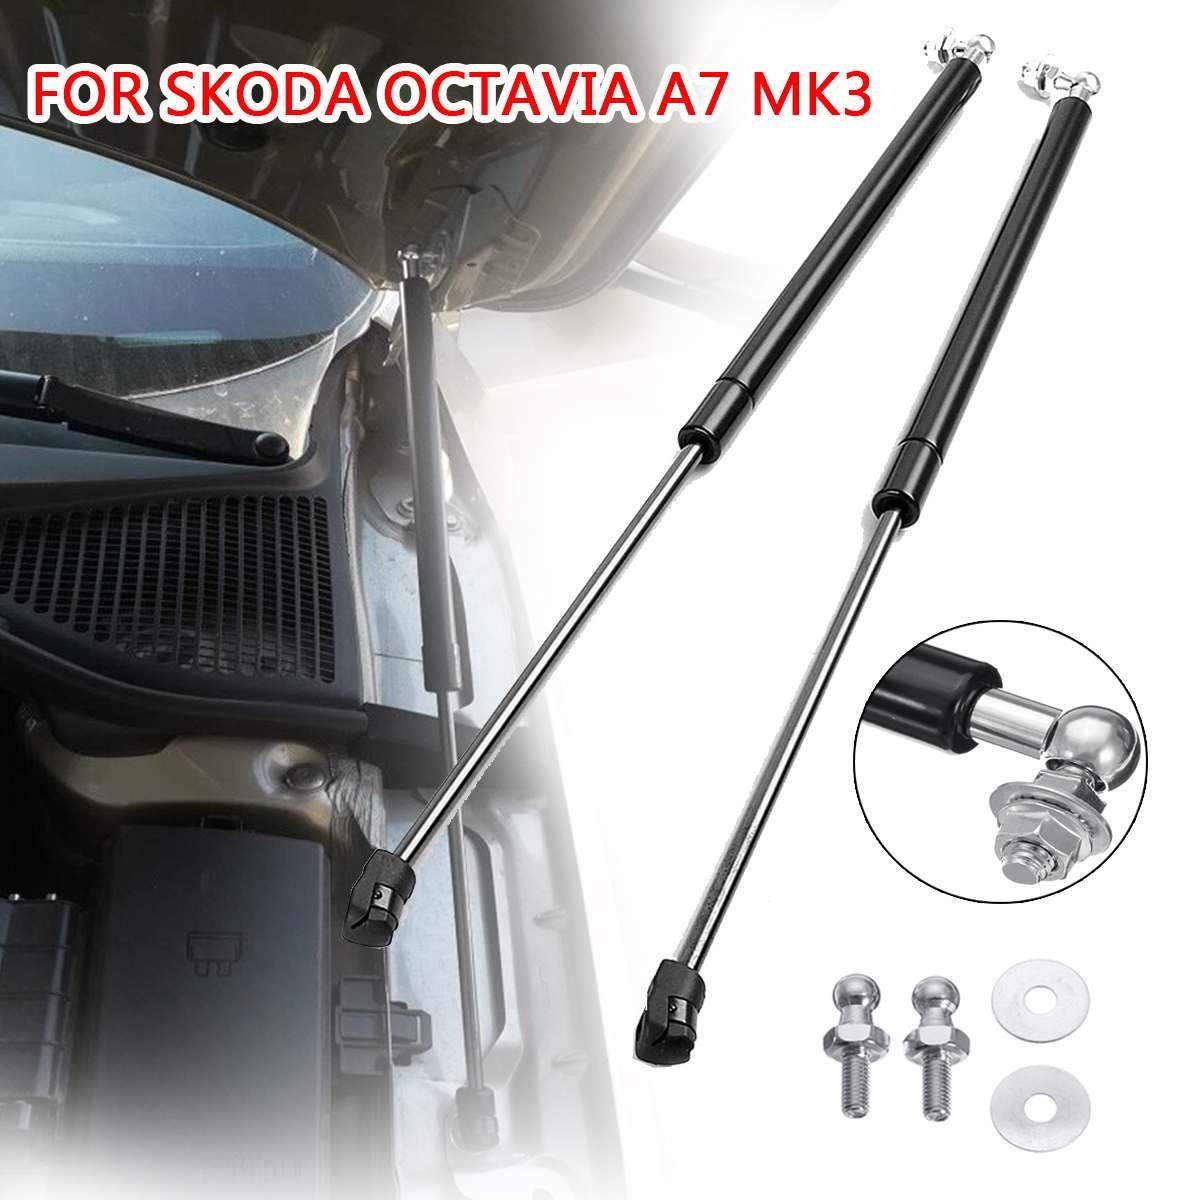 Skoda octavia a7 mk3 용 2 pcs 자동차 후방 가스 충격 후드 충격 스트럿 댐퍼 리프트 지원